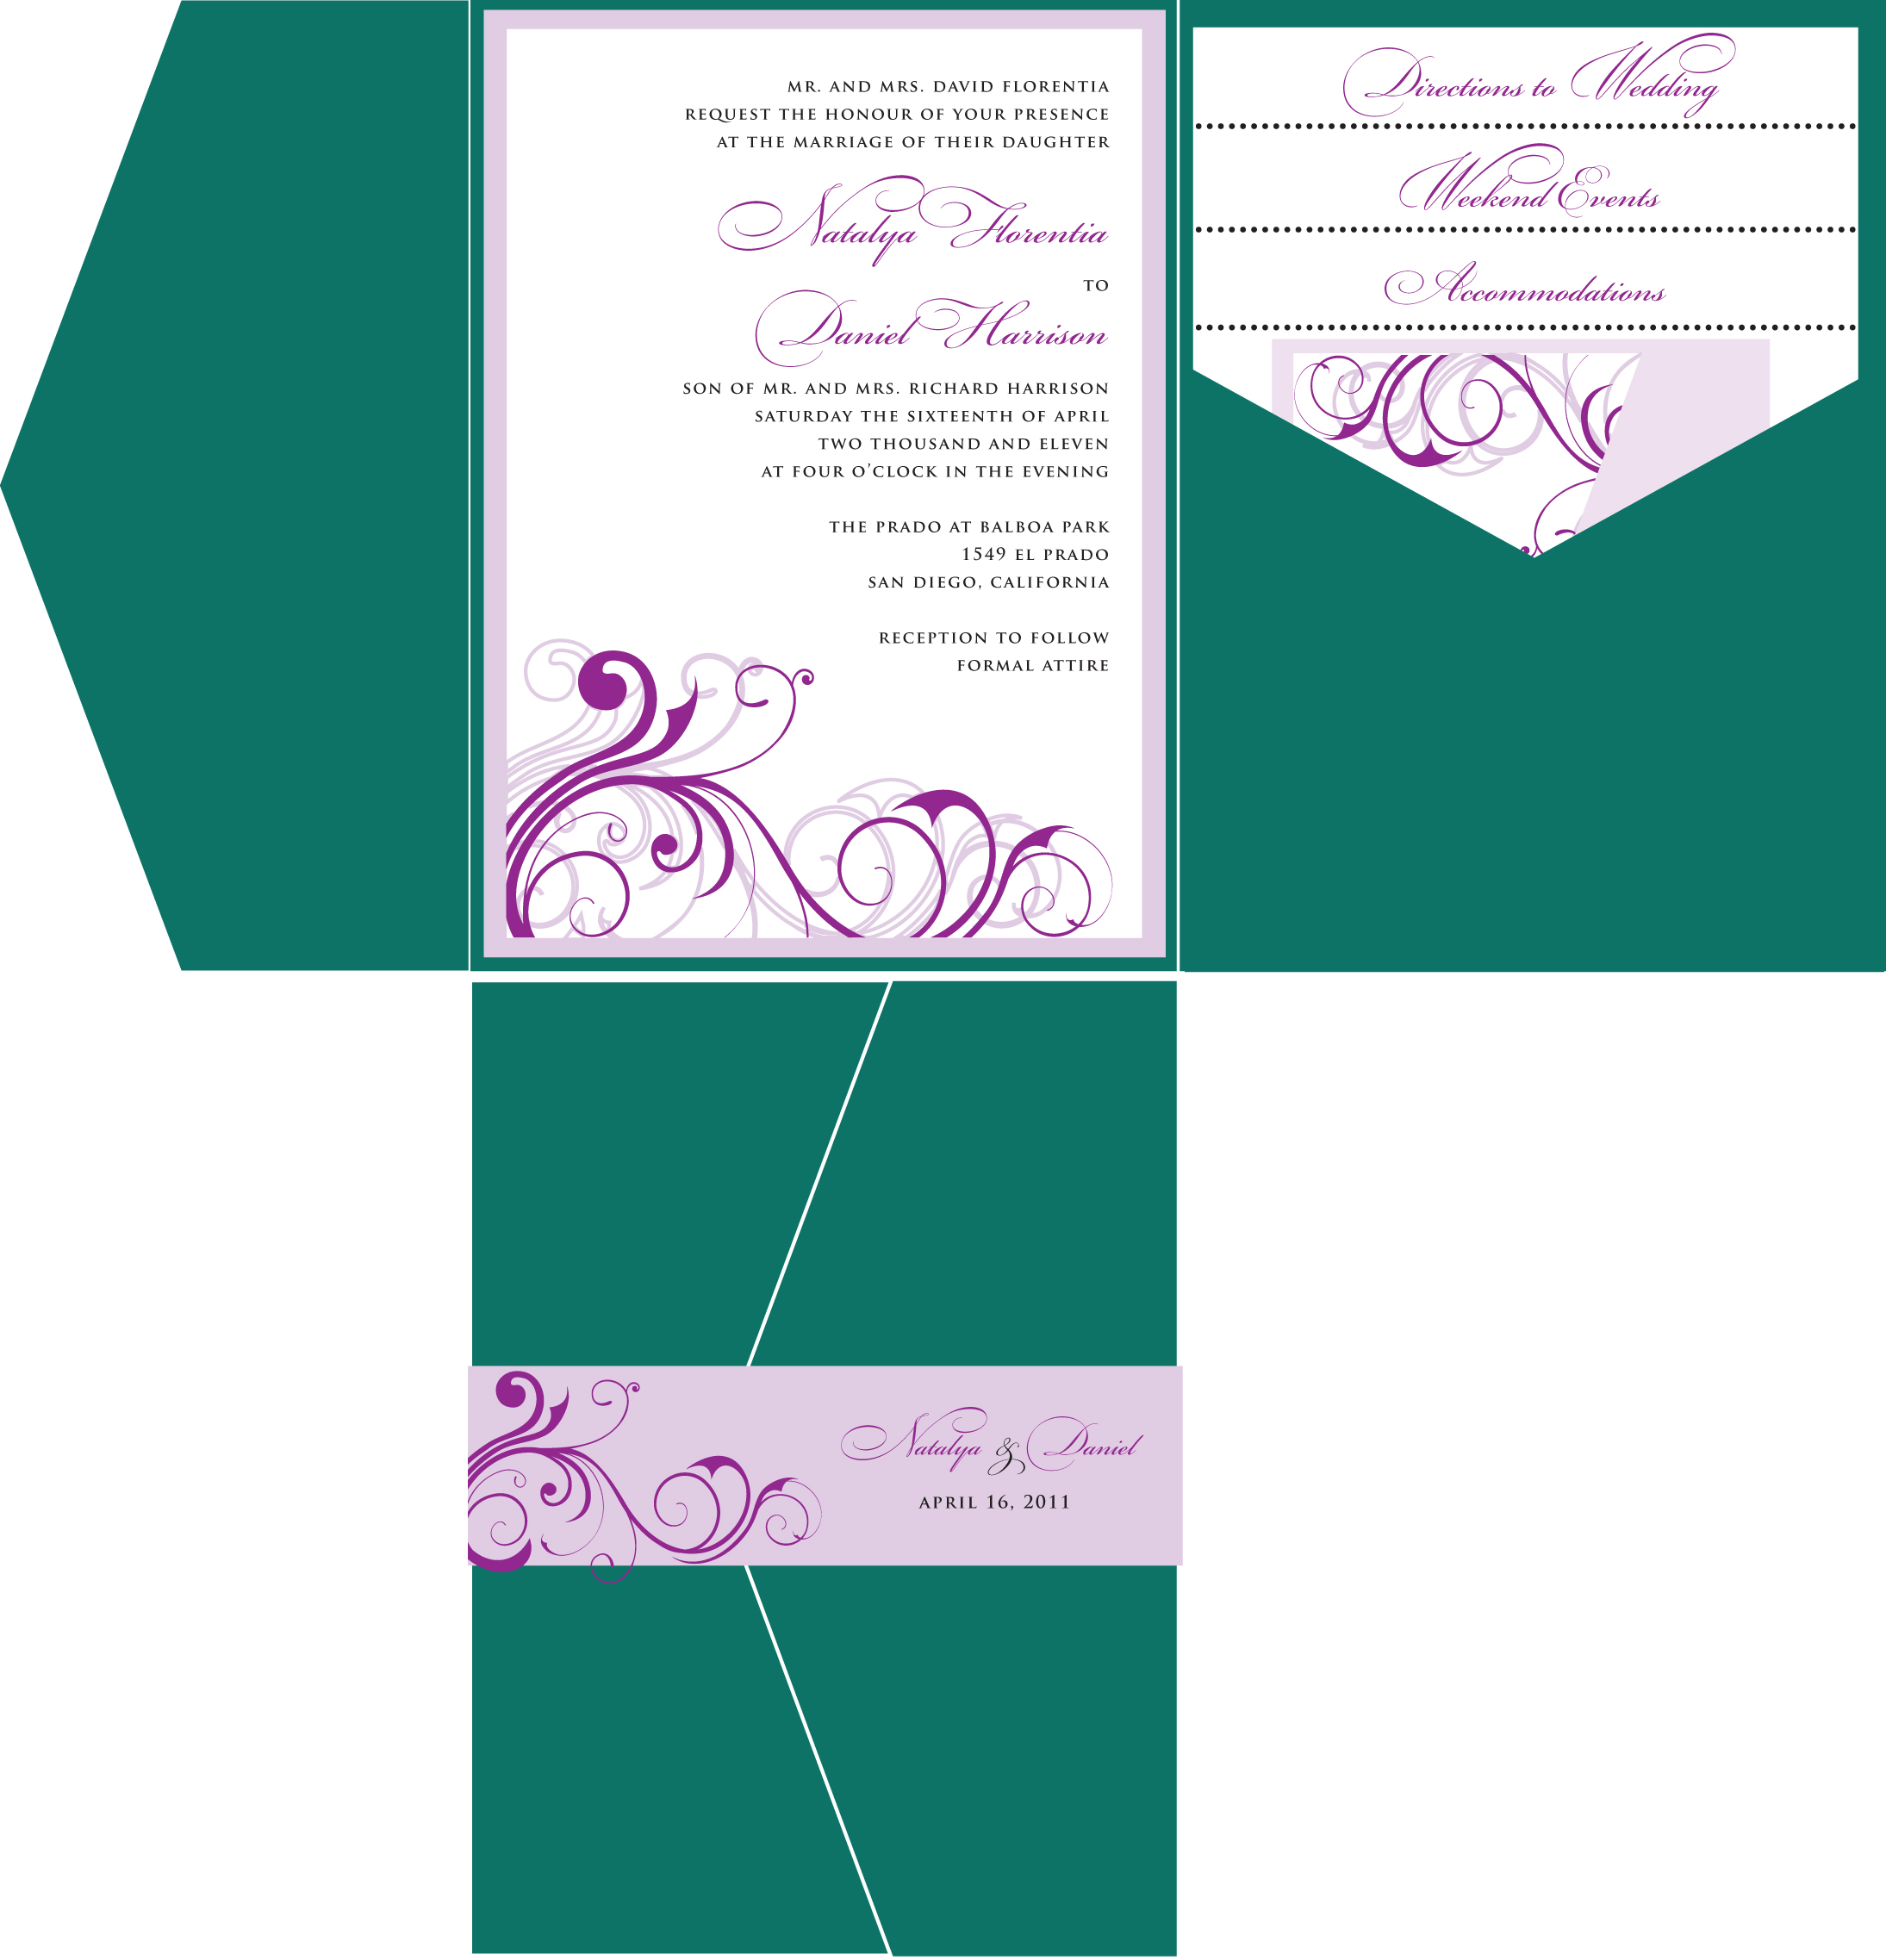 Emerald Green & Purple Wedding Invitation – A Vibrant Wedding